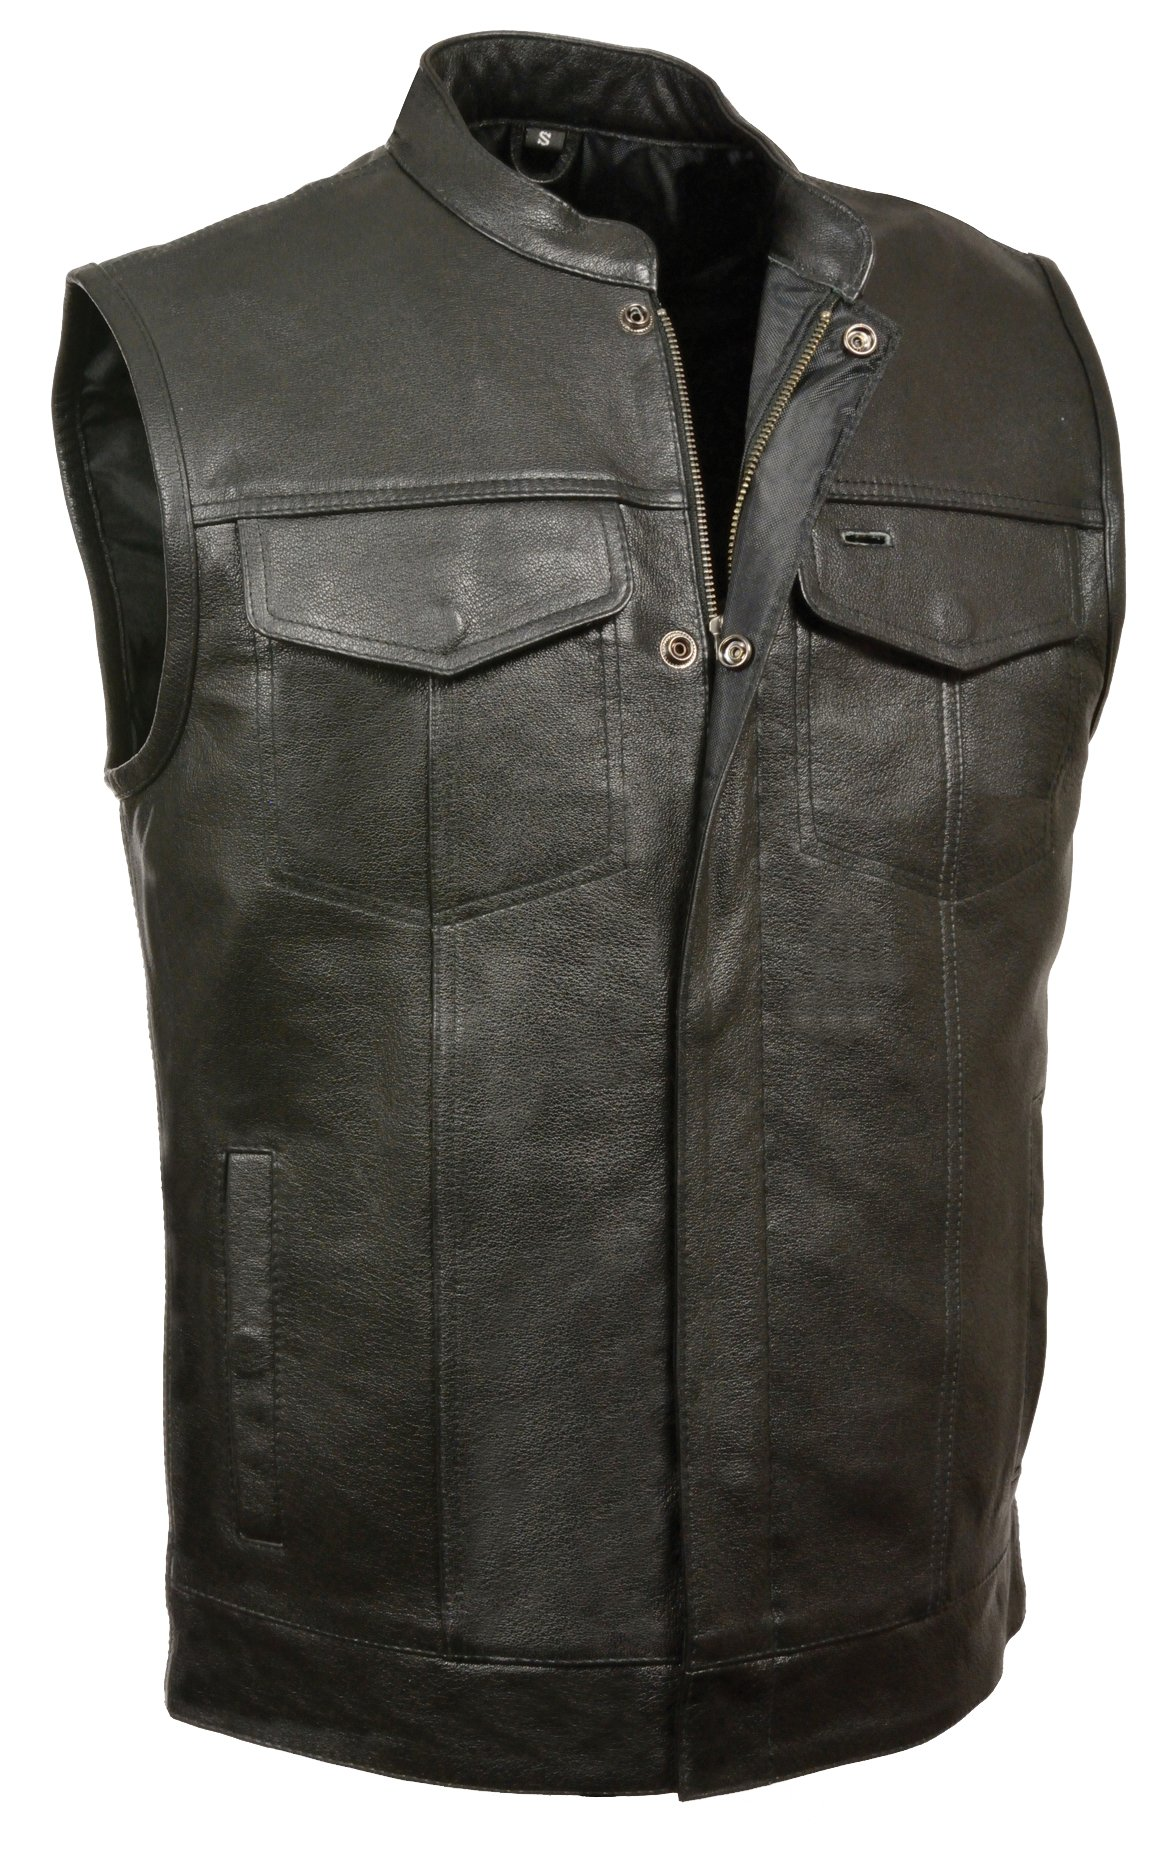 SOA Men's Basic Leather Motorcycle Vest Zipper & Snap Closure w/2 Inside Gun Pockets & Single Panel Back (XXX-Large, 1'' Collar) by Milwaukee Leather